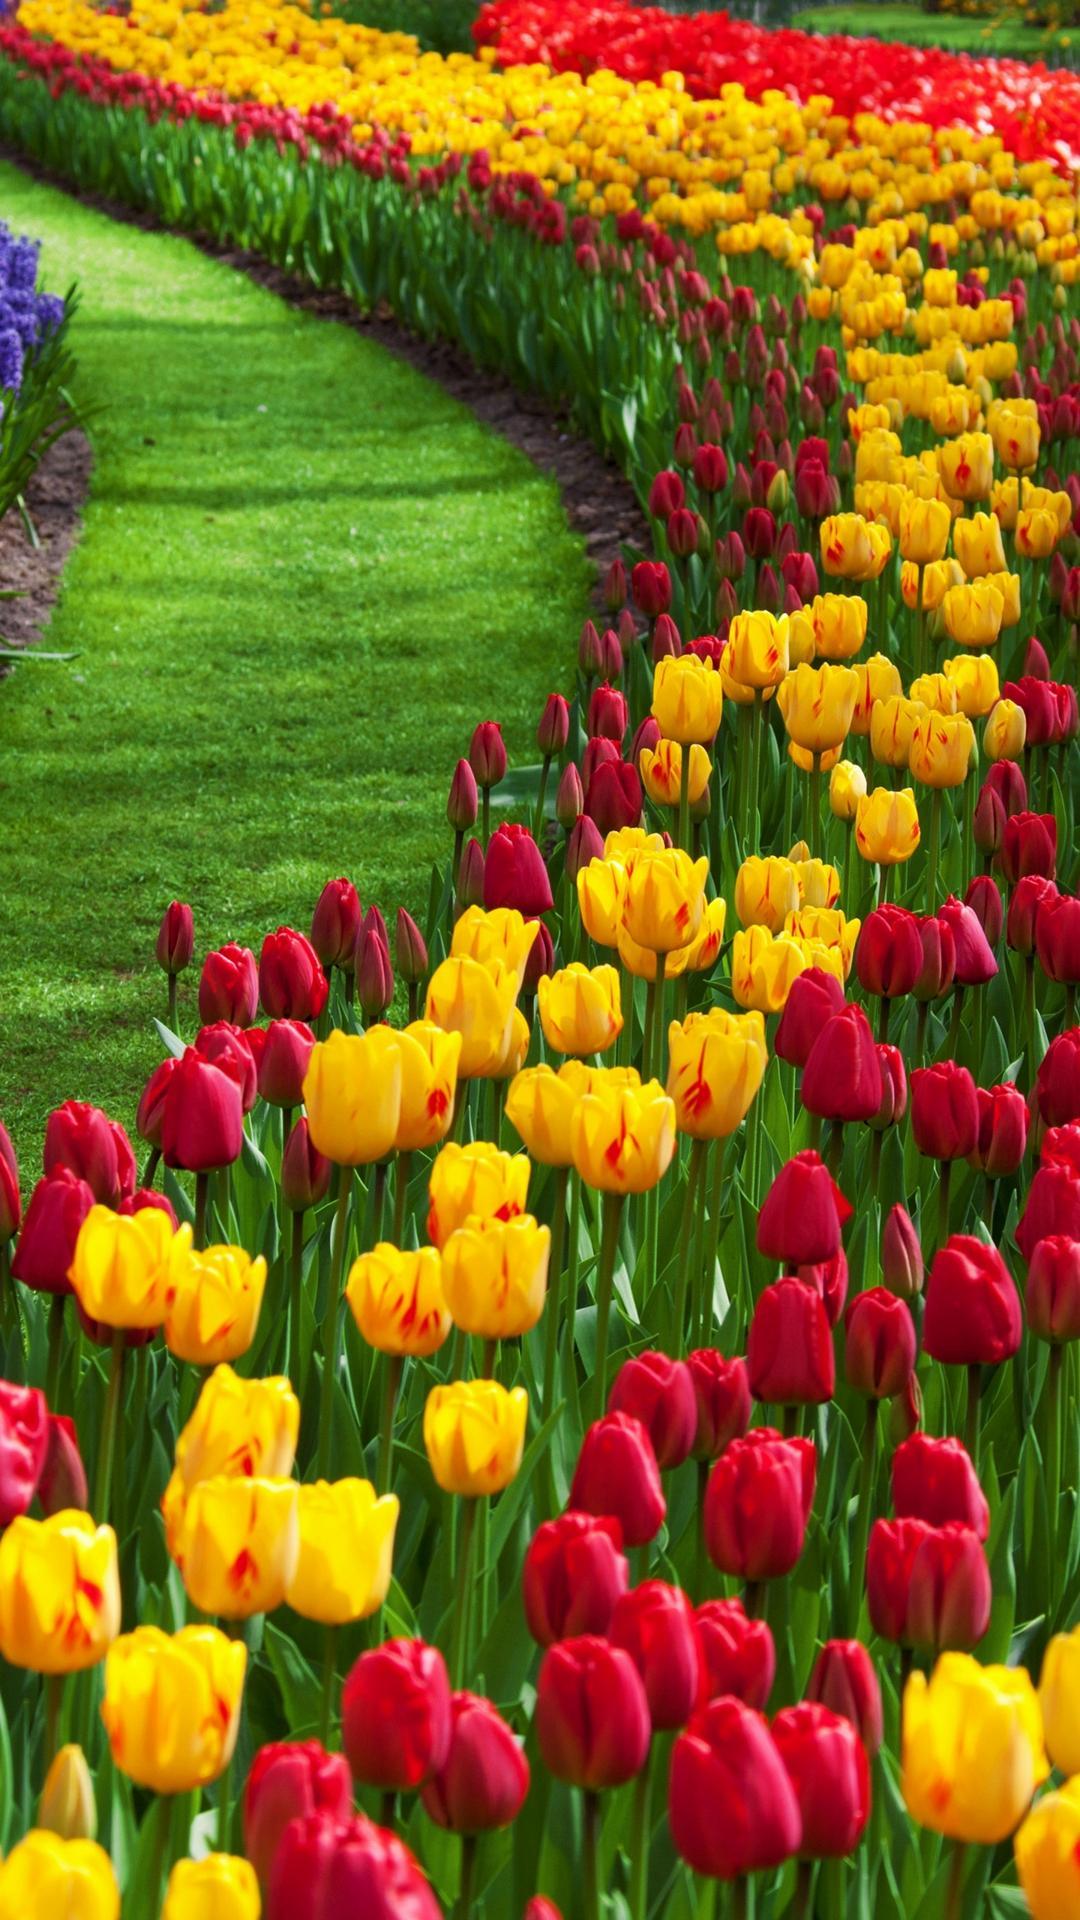 Flowers-c542f575-d2ab-3849-a679-36511eb926f5